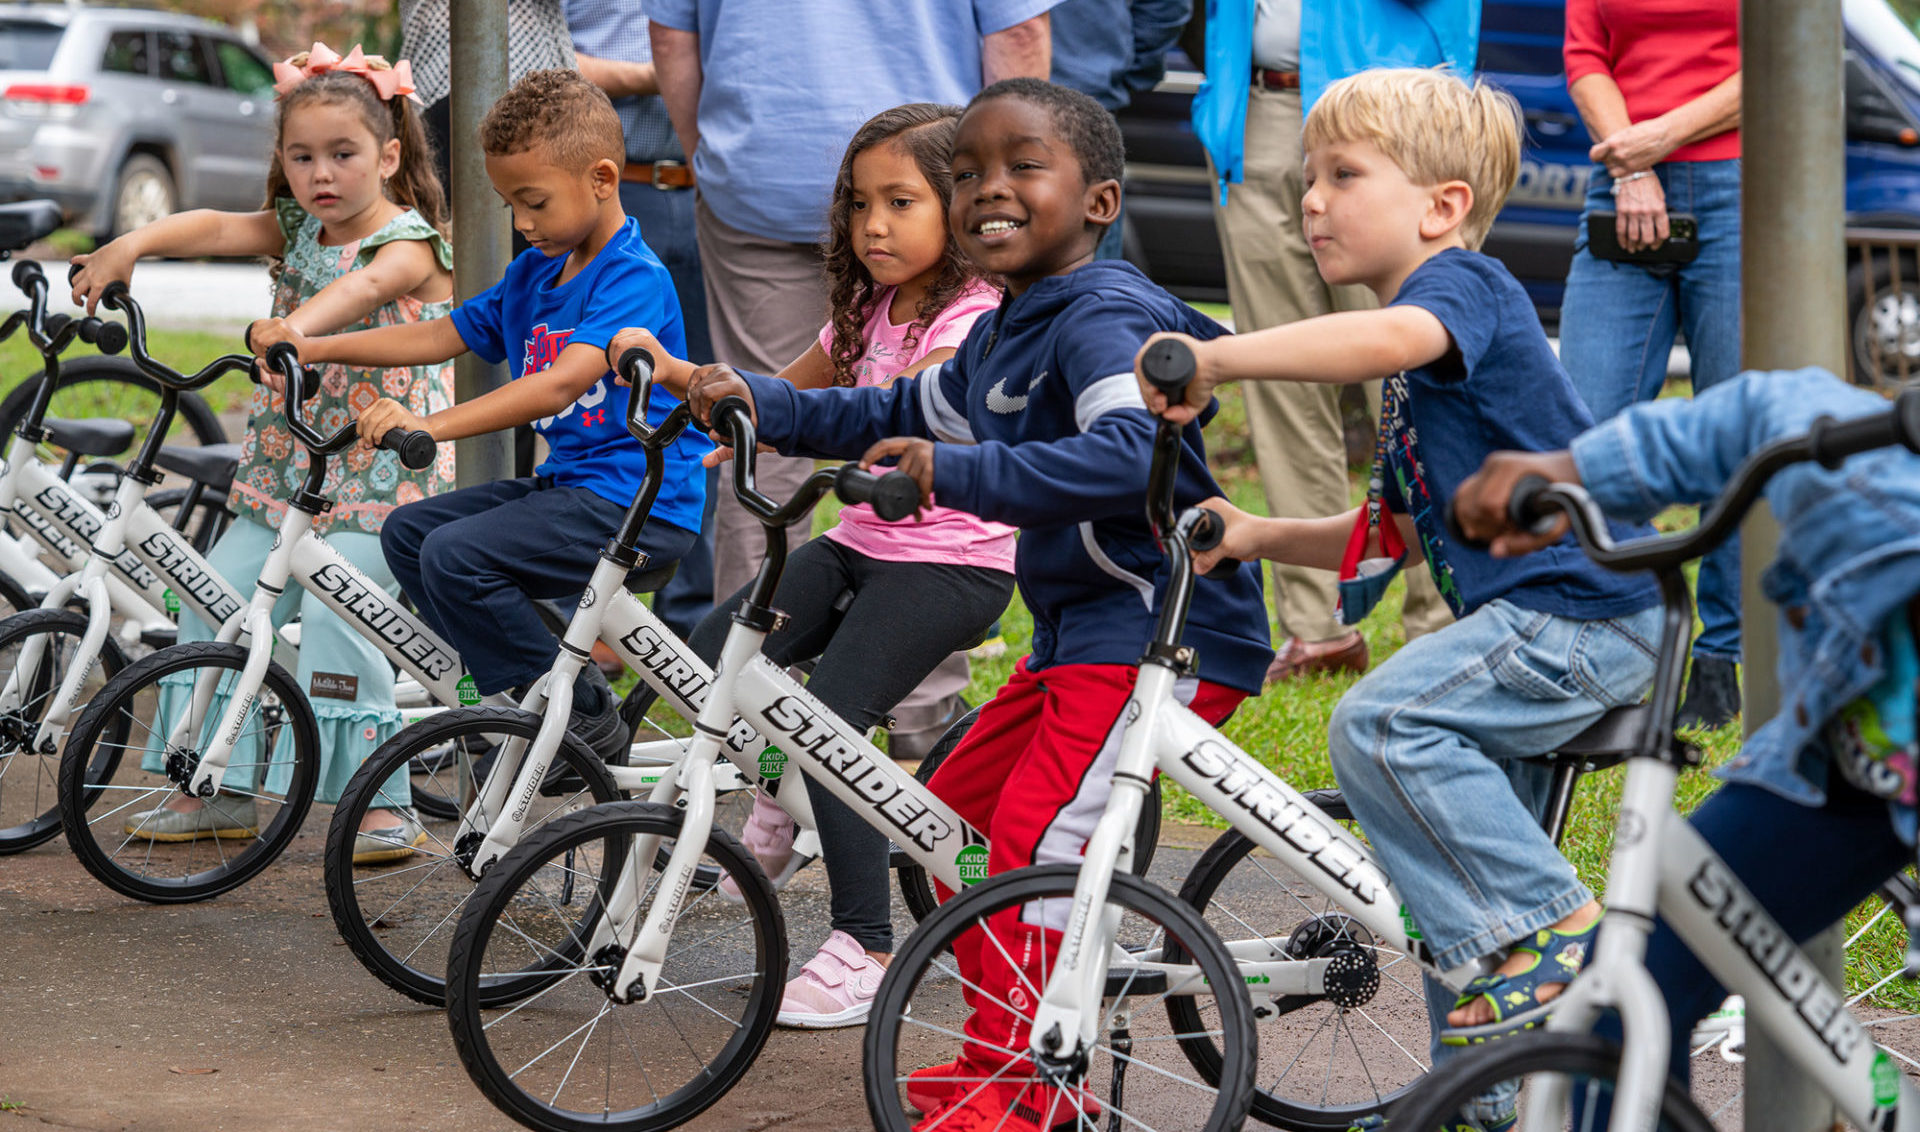 Kindergarteners in Georgia tryout Strider bikes provided by the All Kids Bike initiative, courtesy Yamaha Motor Corp., U.S.A. Photo courtesy Yamaha Motor Corp., U.S.A.